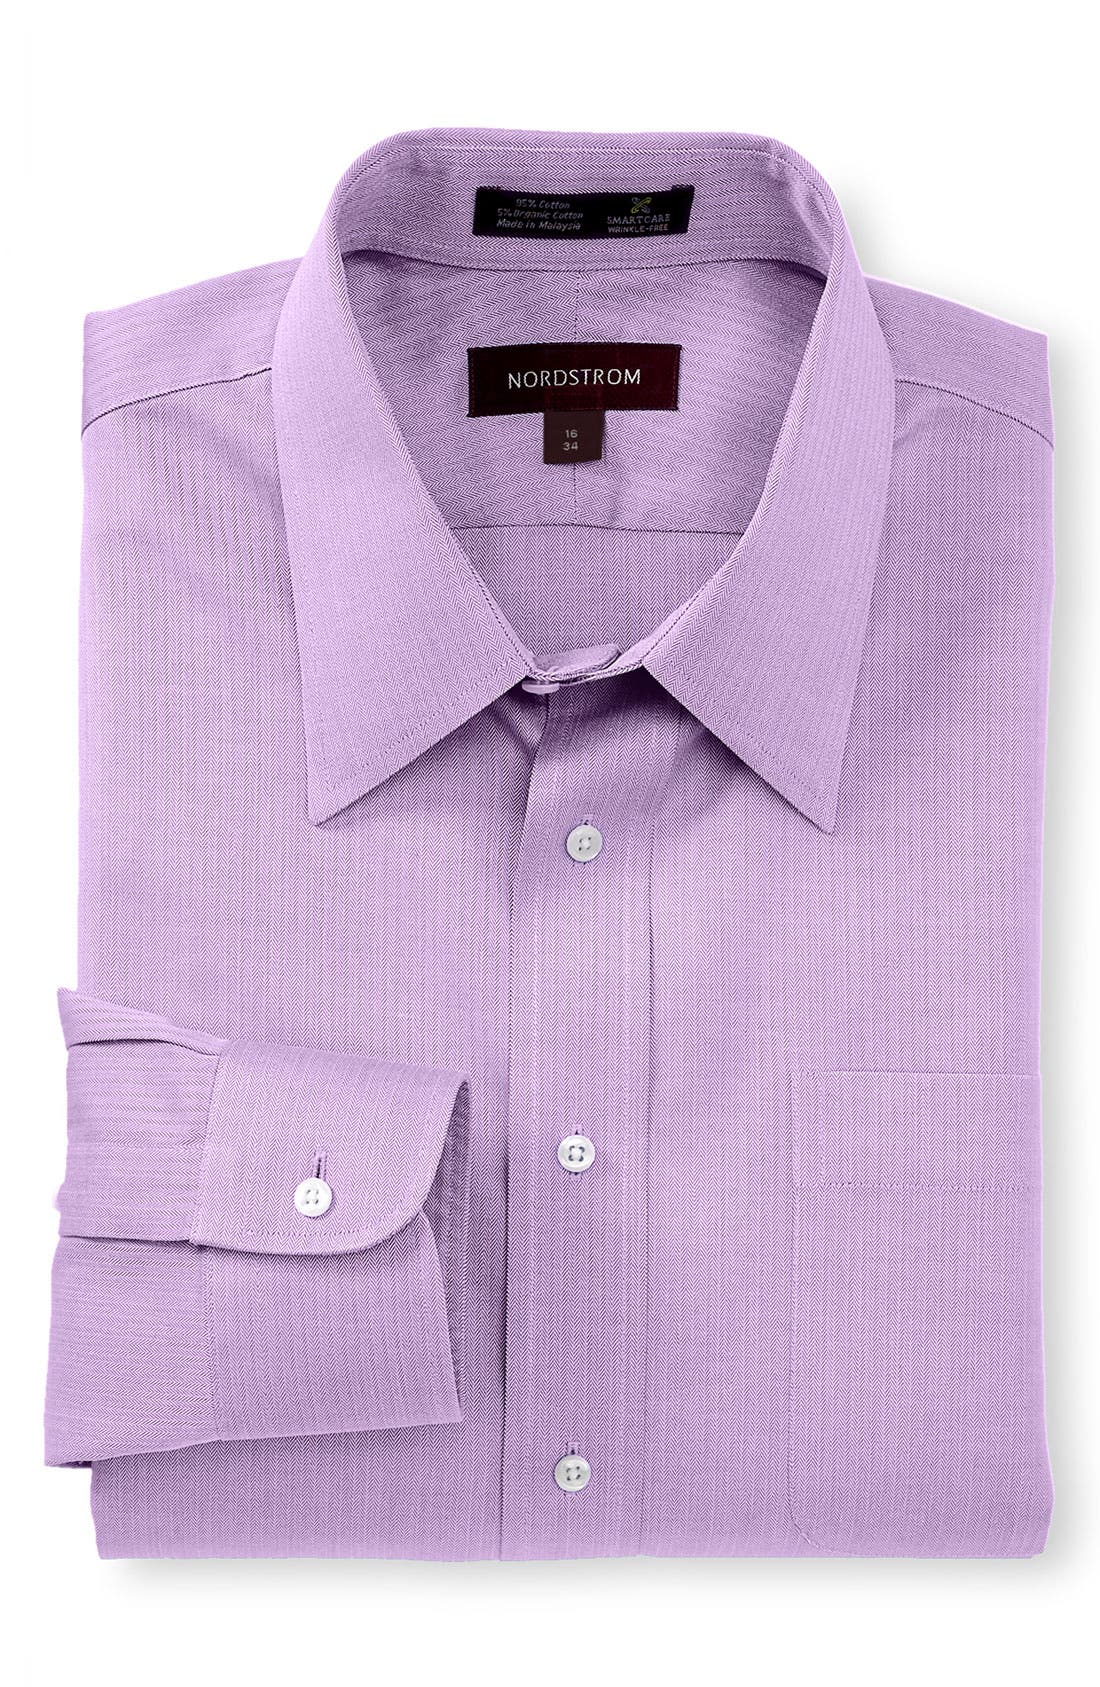 Alternate Image 1 Selected - Nordstrom Men's Shop Smartcare™ Wrinkle Free Traditional Fit Herringbone Dress Shirt